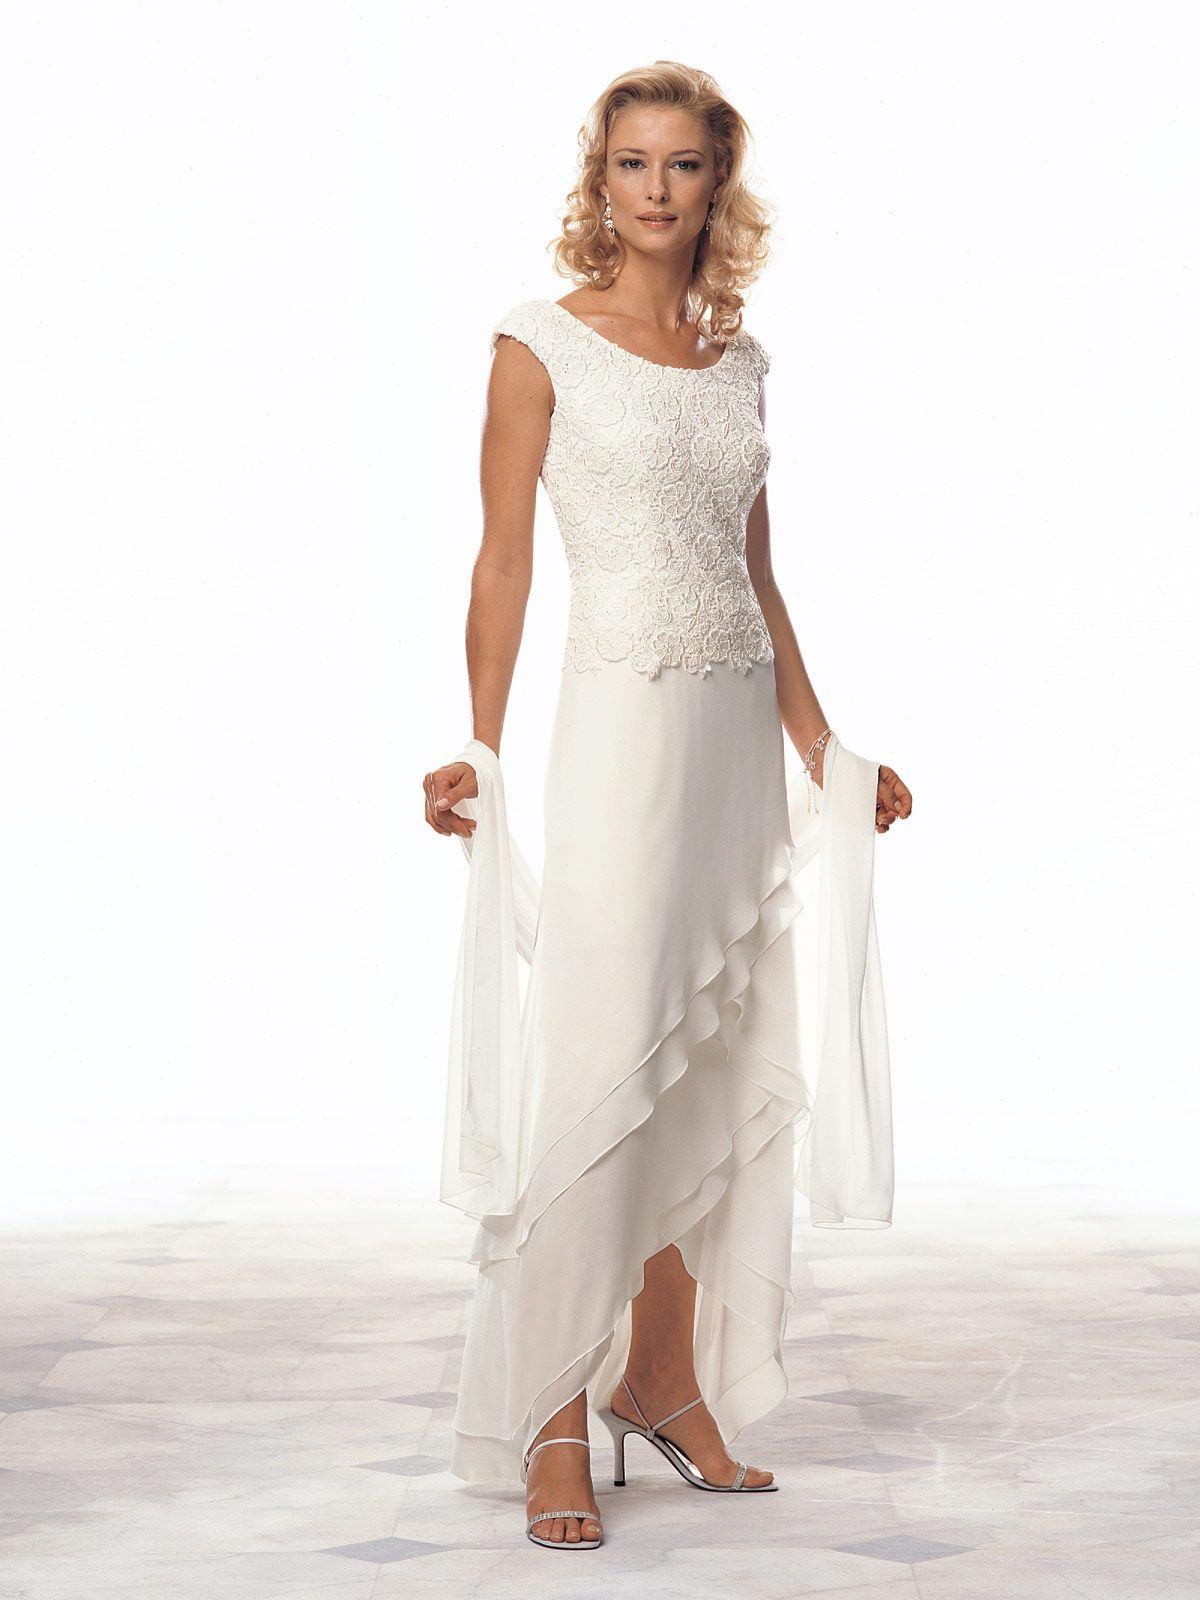 100+ Destination Wedding Dresses for Mother Of the Bride